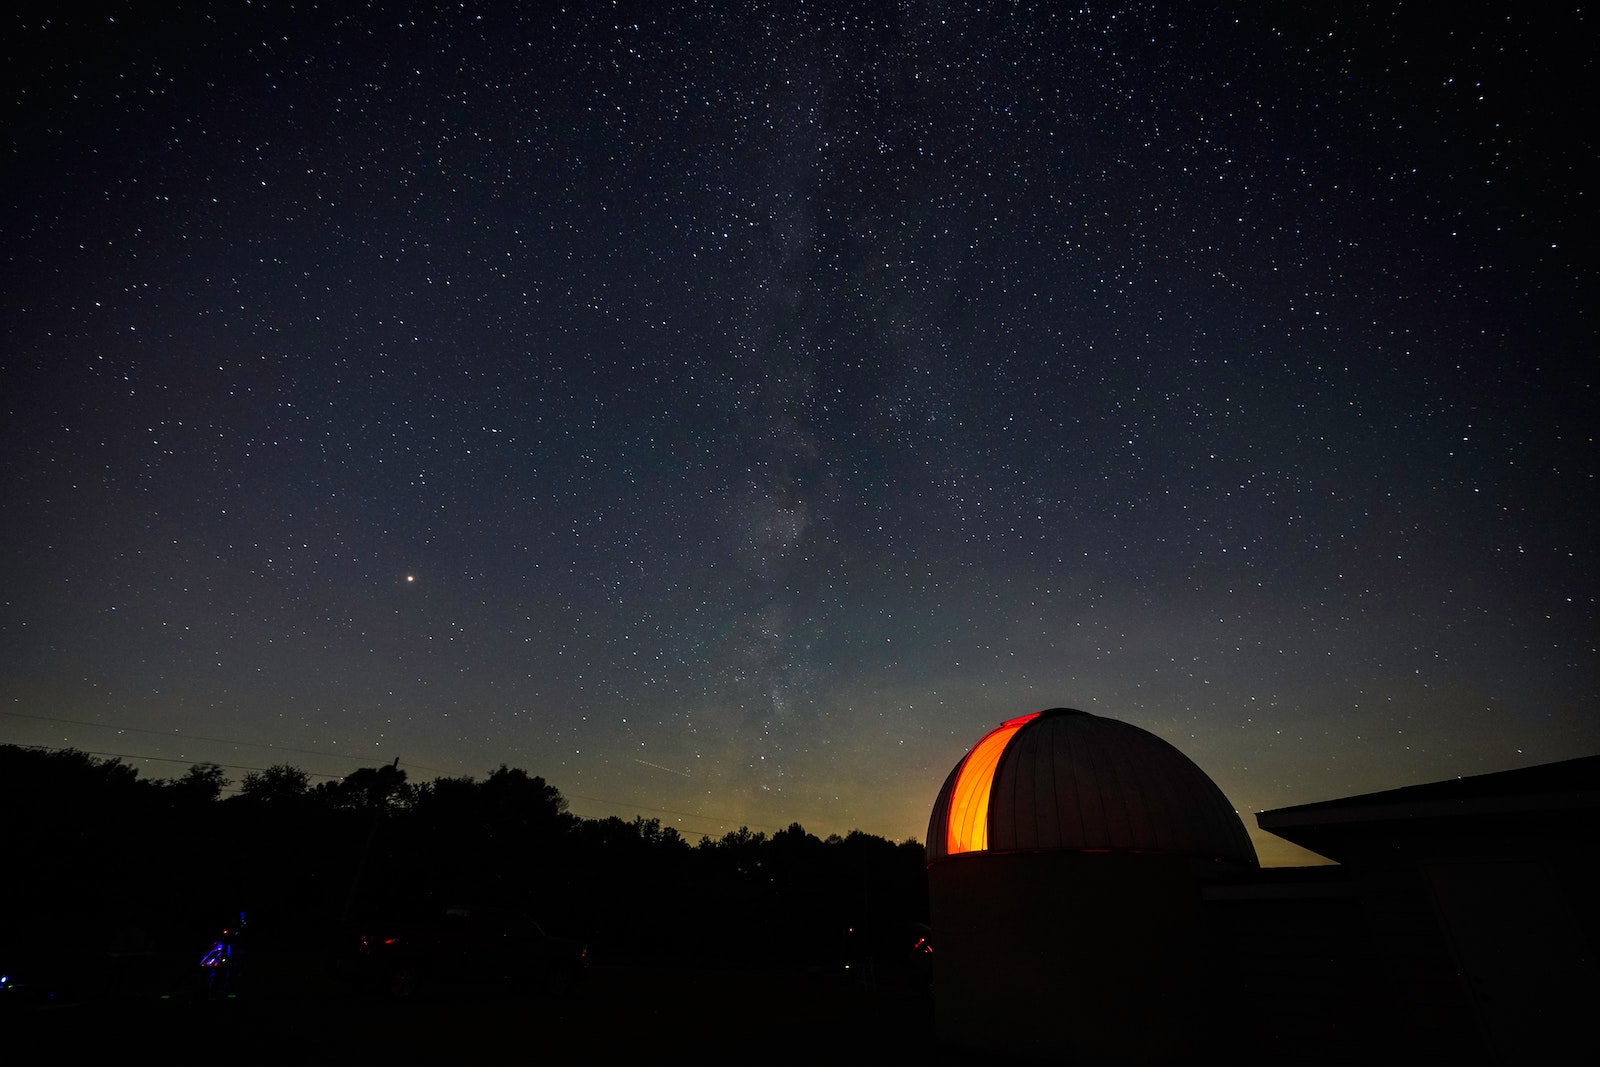 Observatory in Sierra Vista, AZ